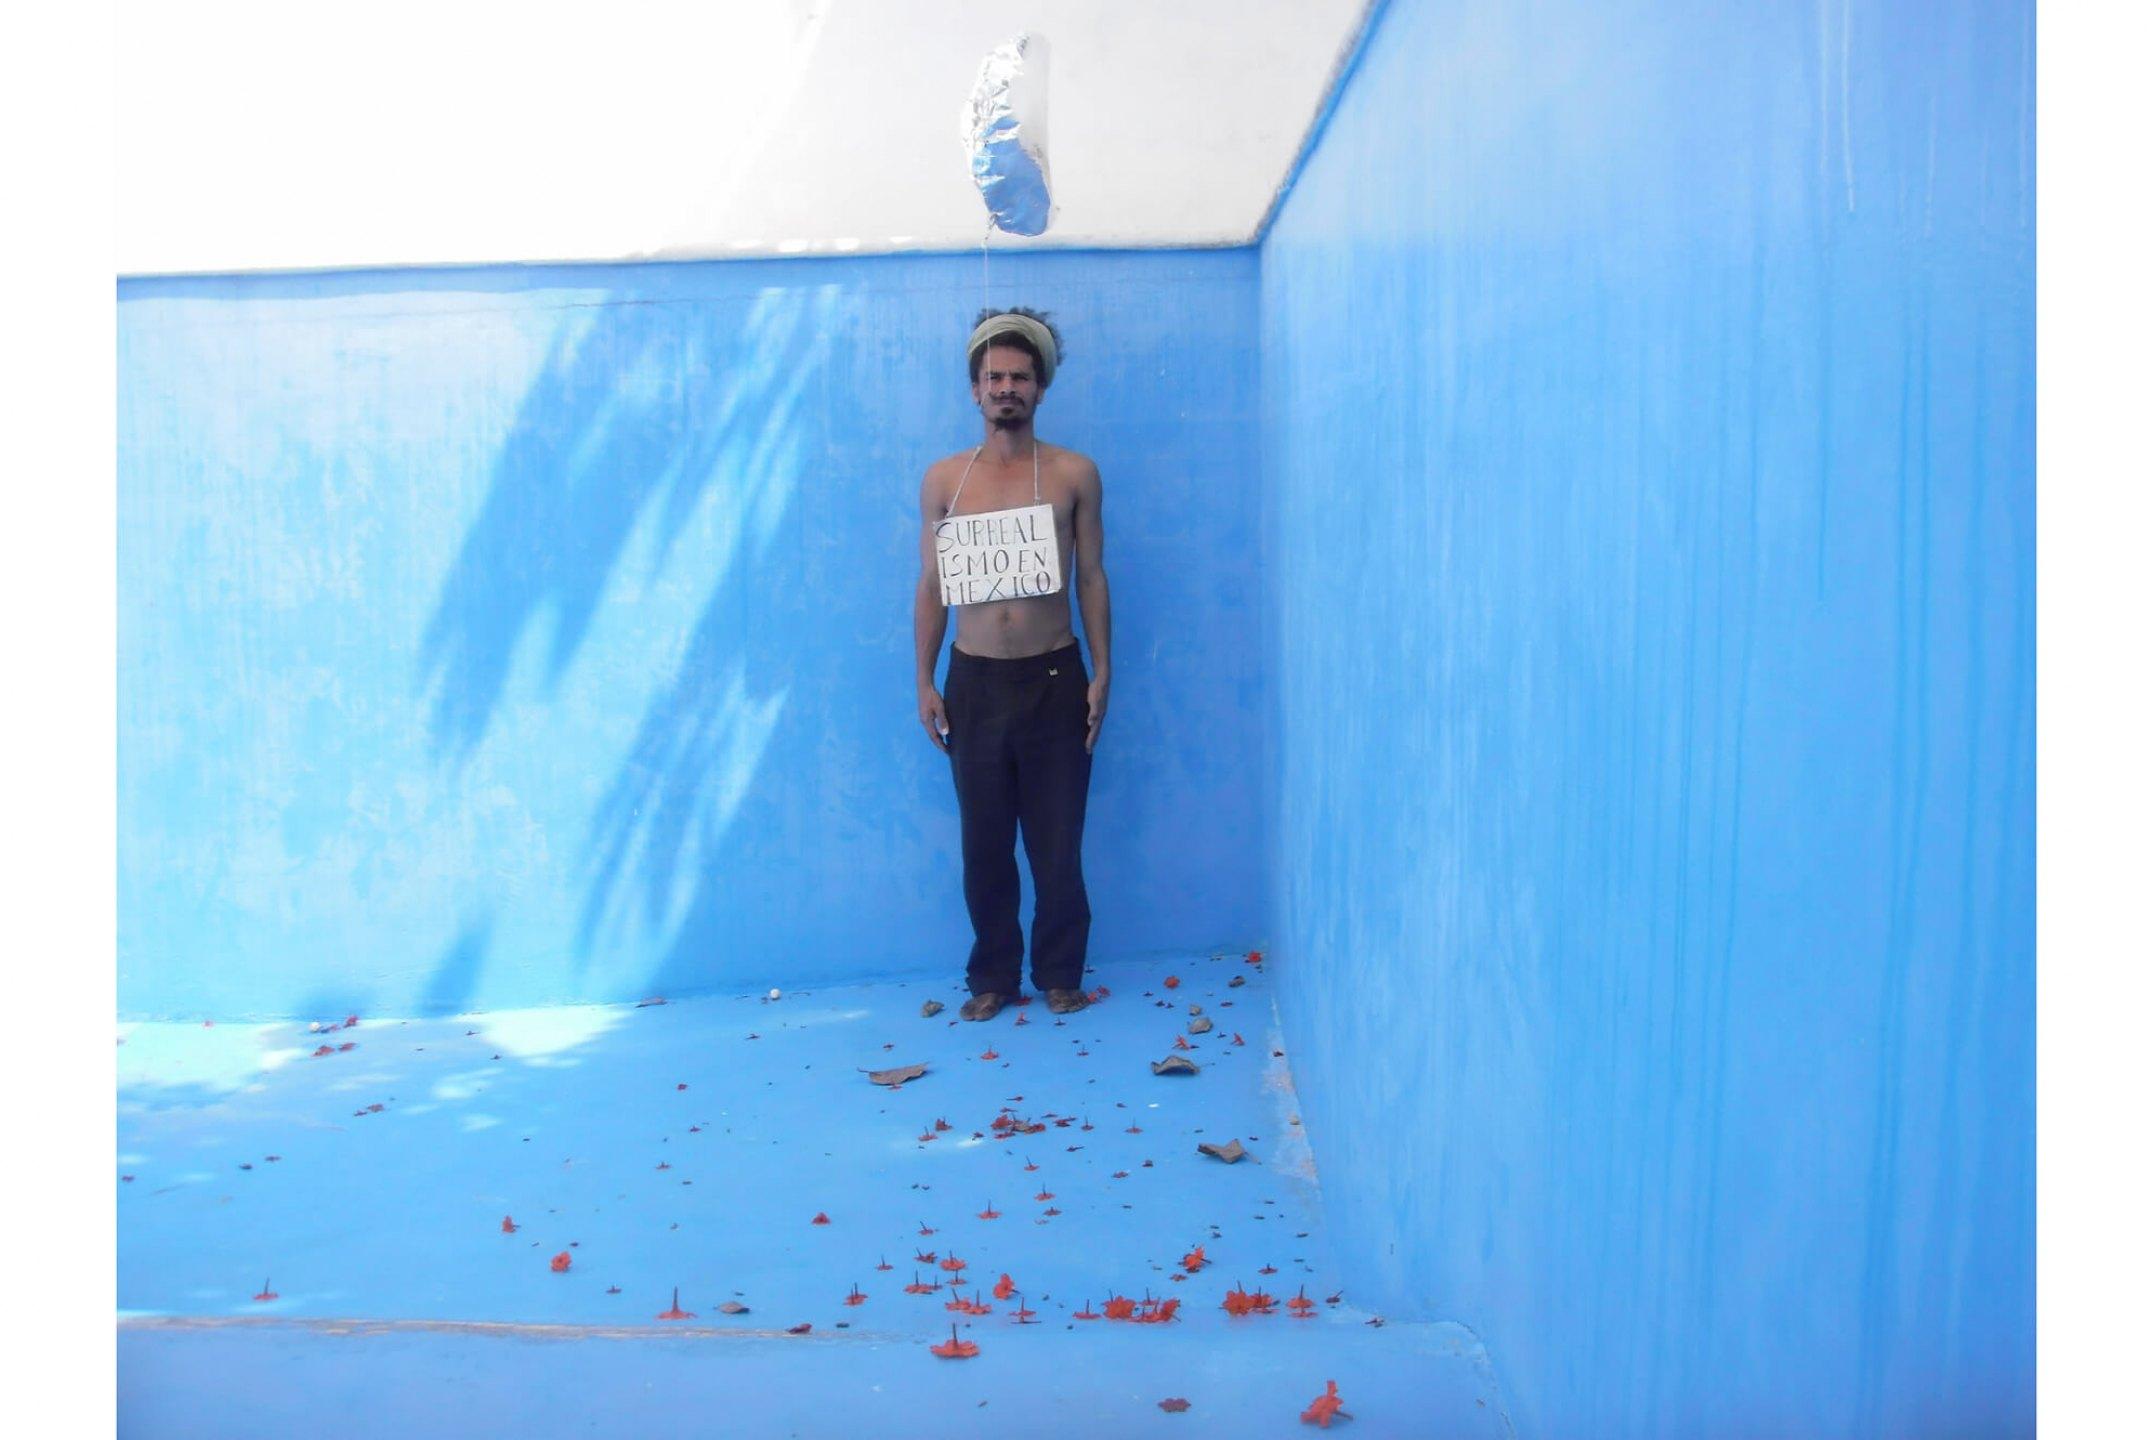 Paulo Nazareth, <em>NA - Surrealismo en Mexico</em>,2011, photo printing on cotton paper, 67,5 × 90 cm - Mendes Wood DM